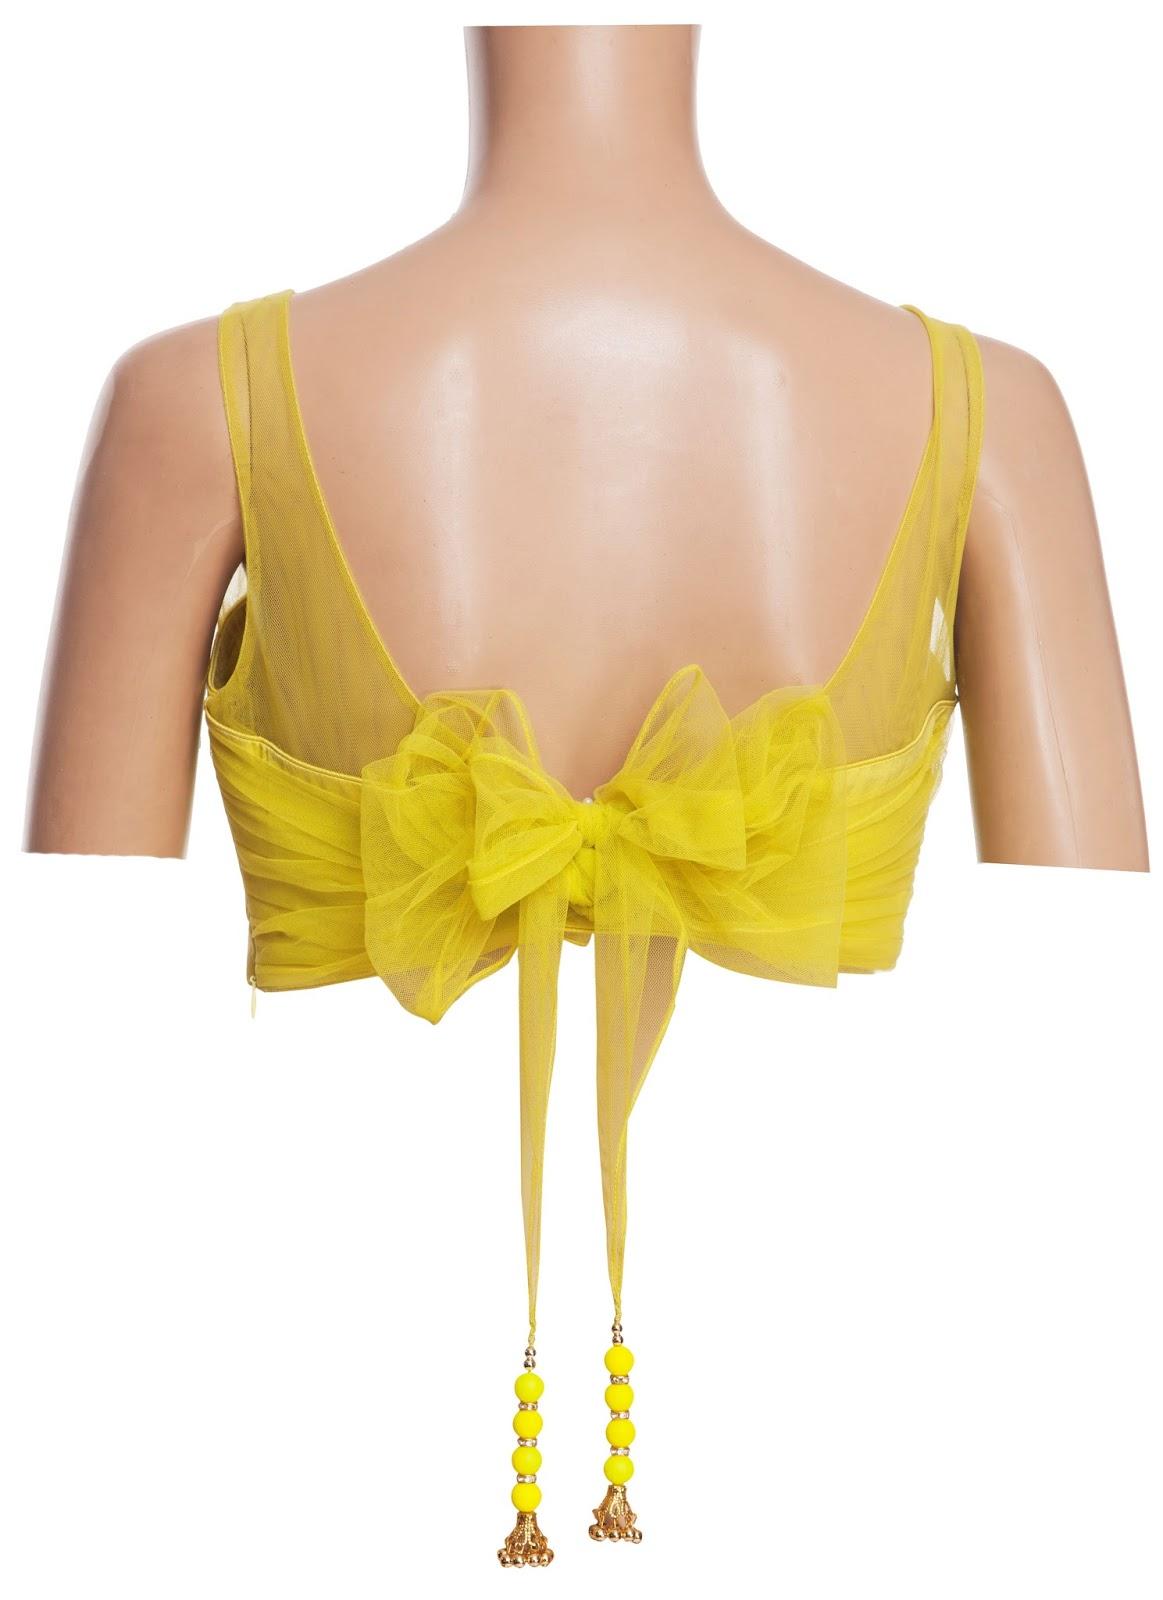 Chiffon Tie Neck Blouse